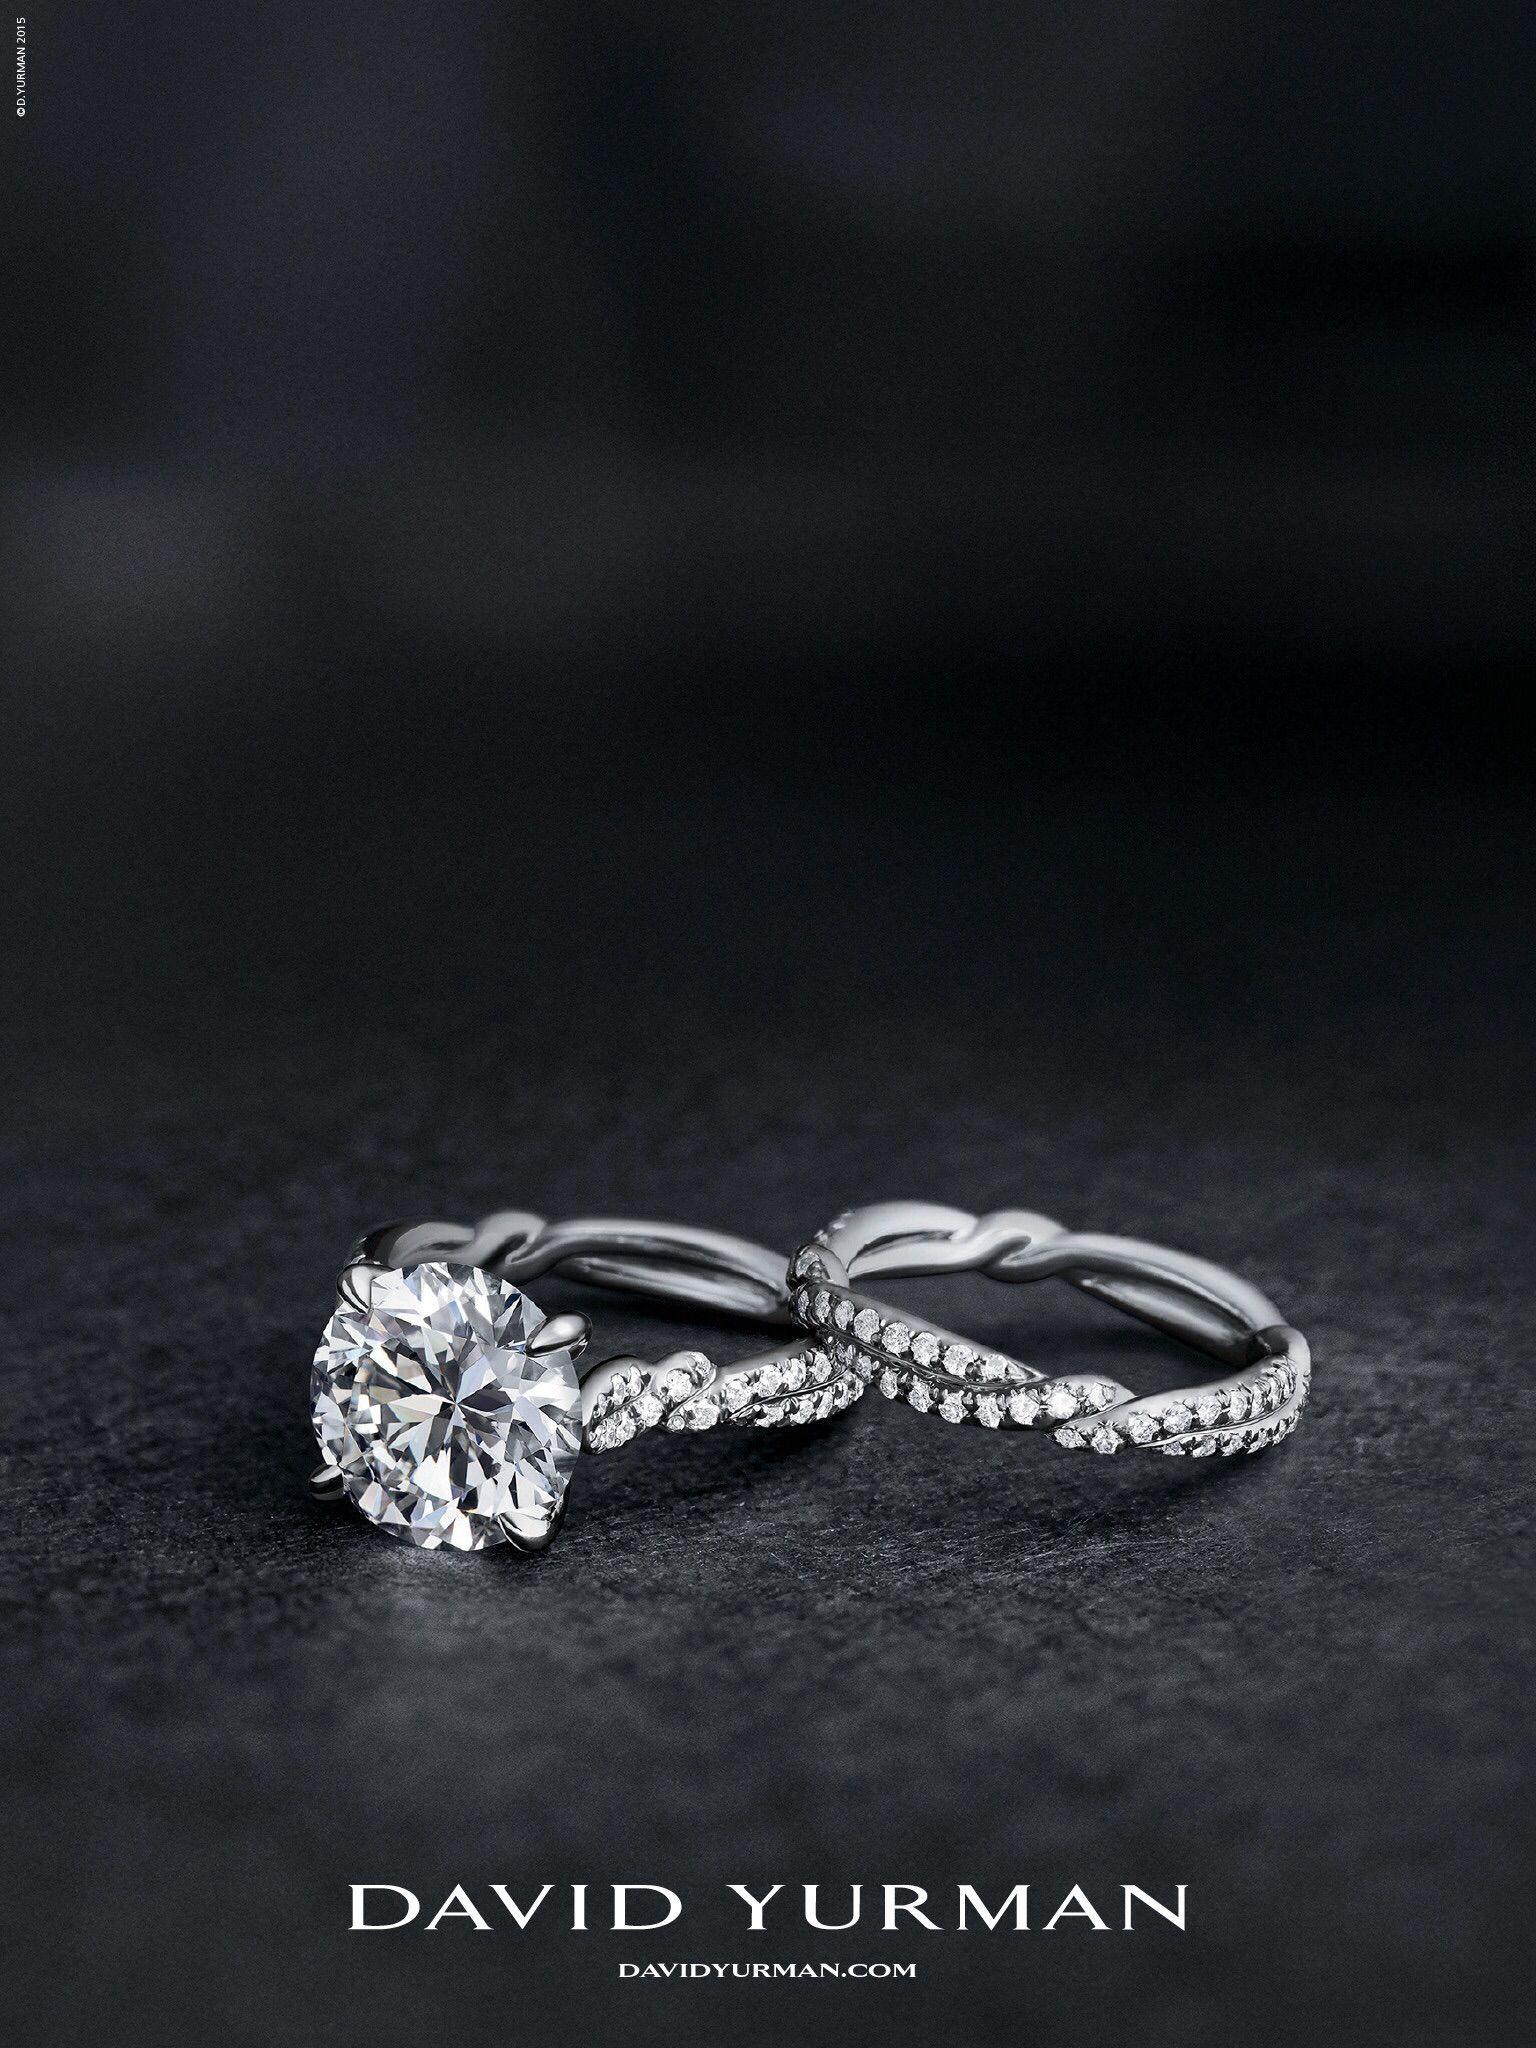 David Yurman Jewelry Advertising Bridal Rings Wedding Ring Bands